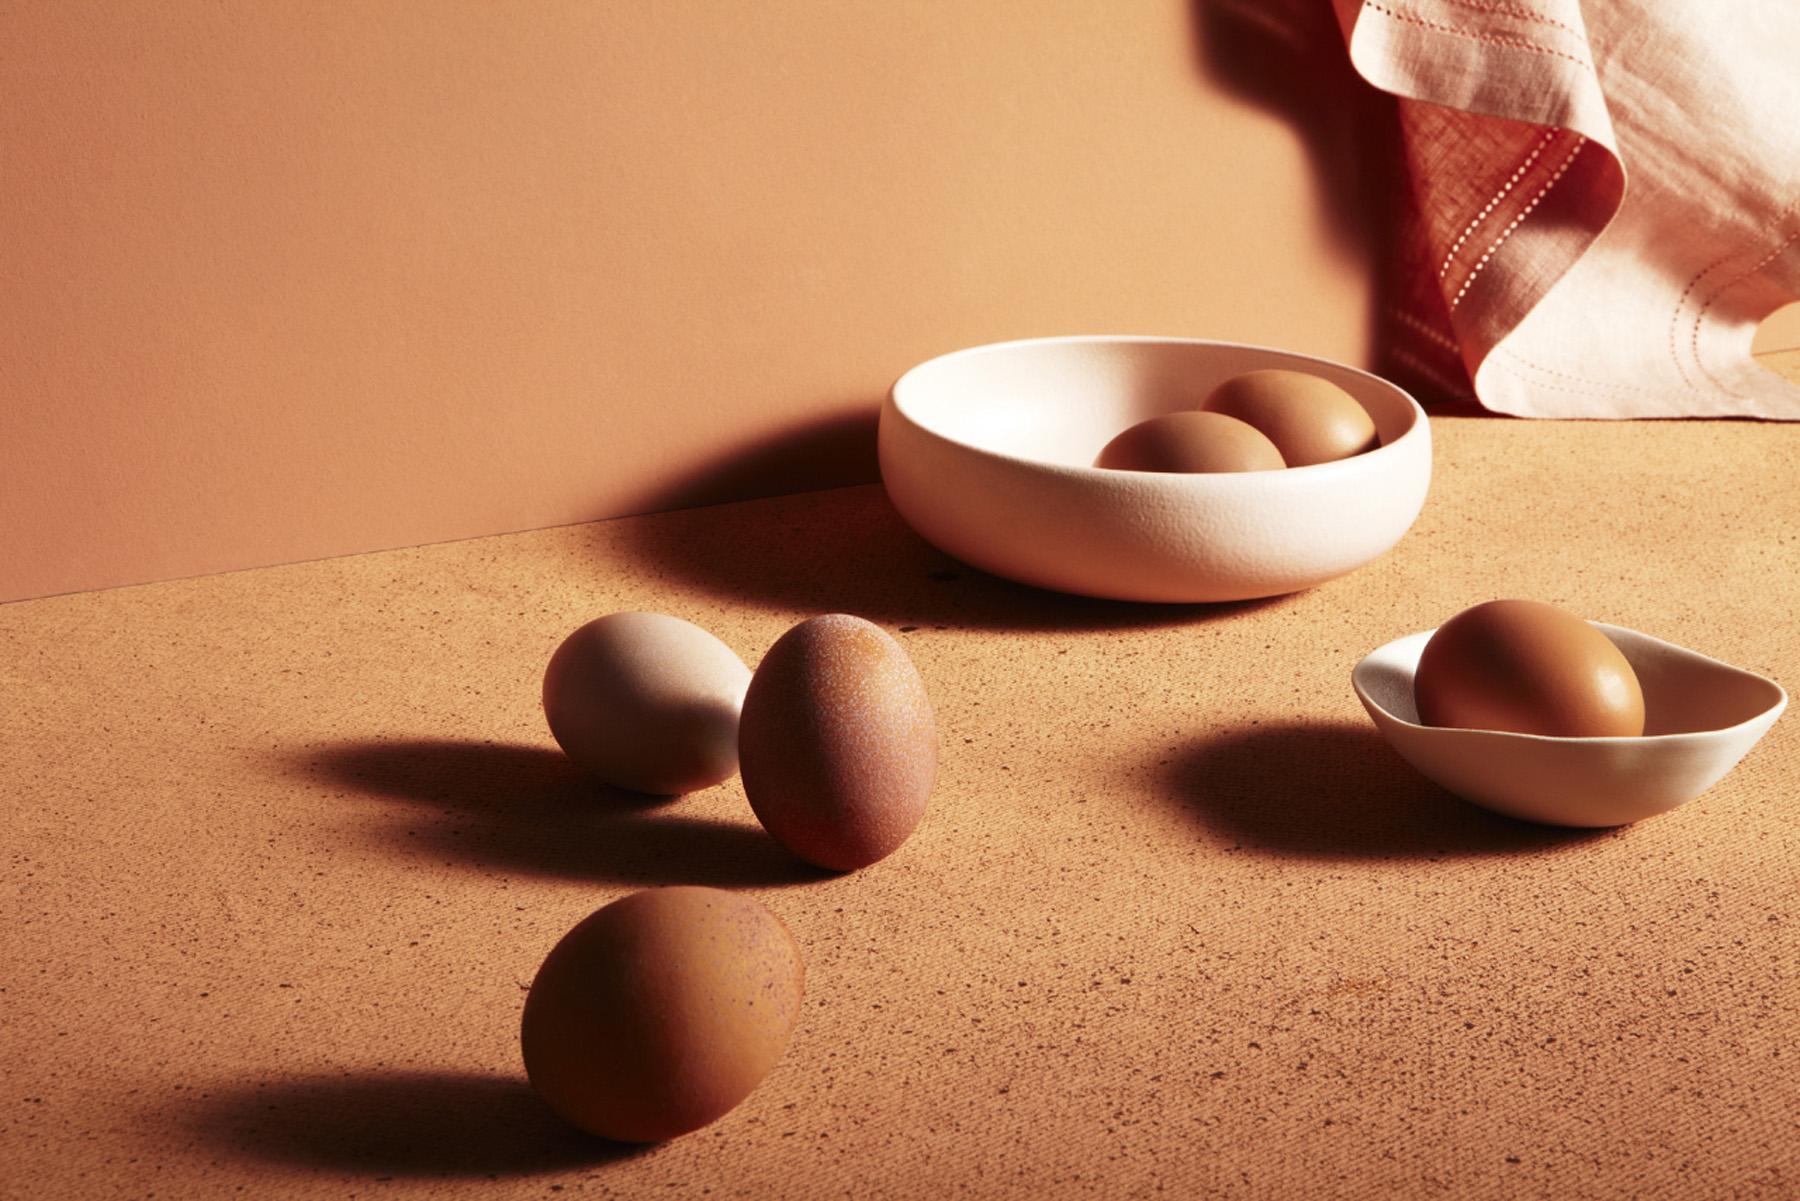 17-icon-artist-management-katie-hammond-food-pink_exploration_of_eggs_ret_web.jpg